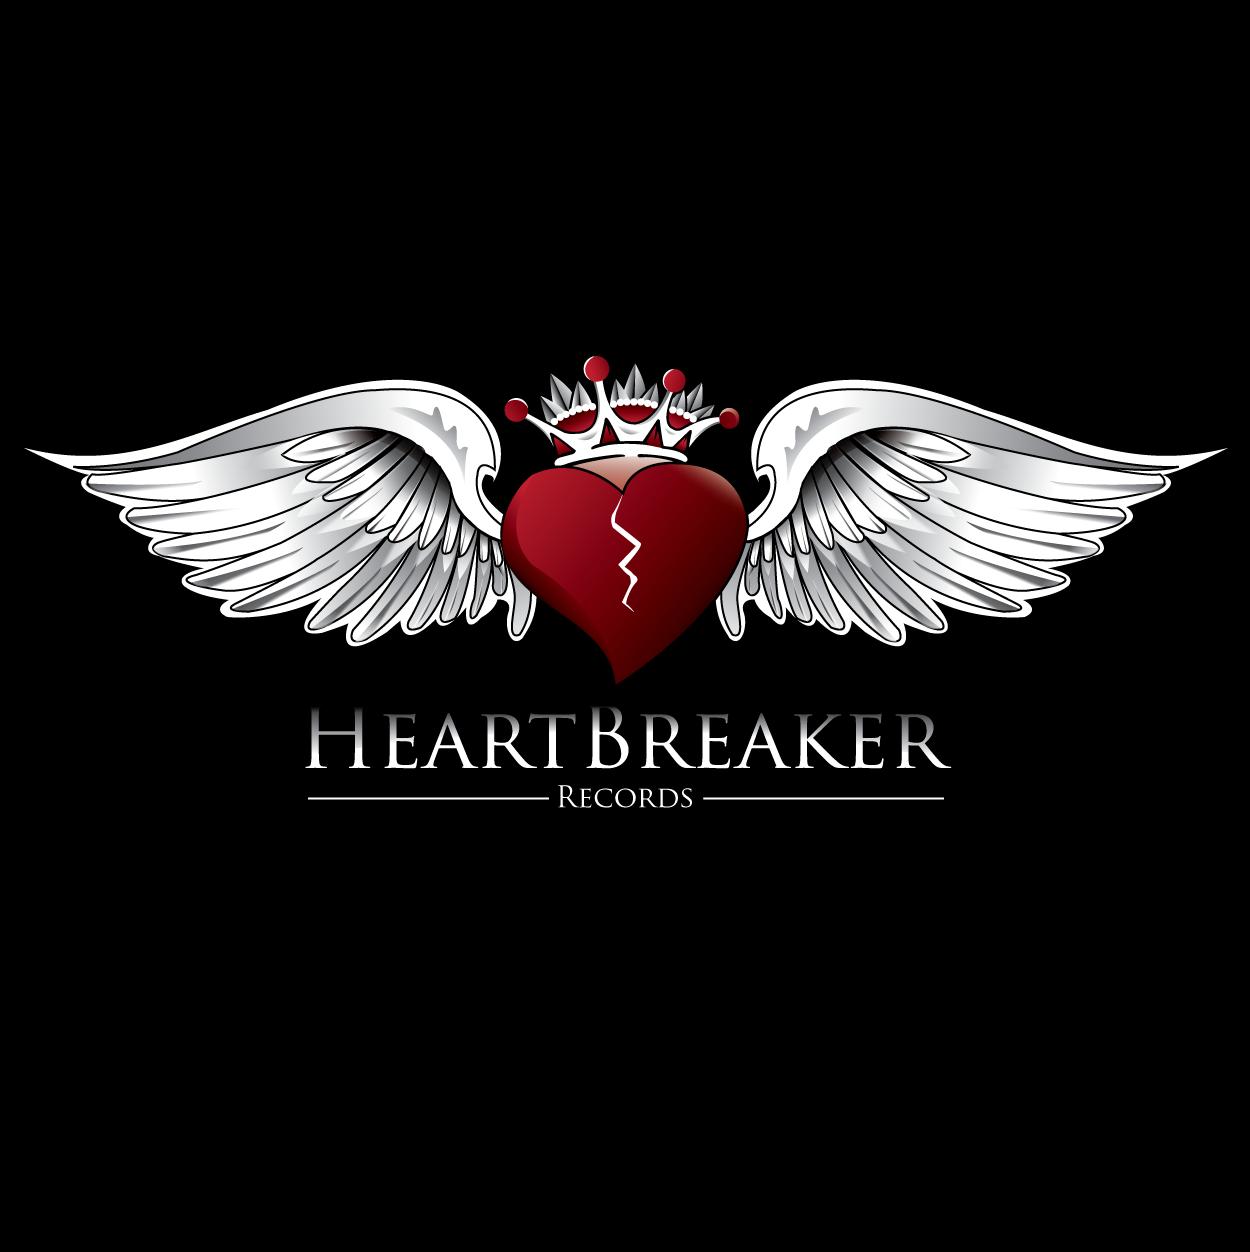 Logo Design by trabas - Entry No. 63 in the Logo Design Contest Heartbreaker Records.